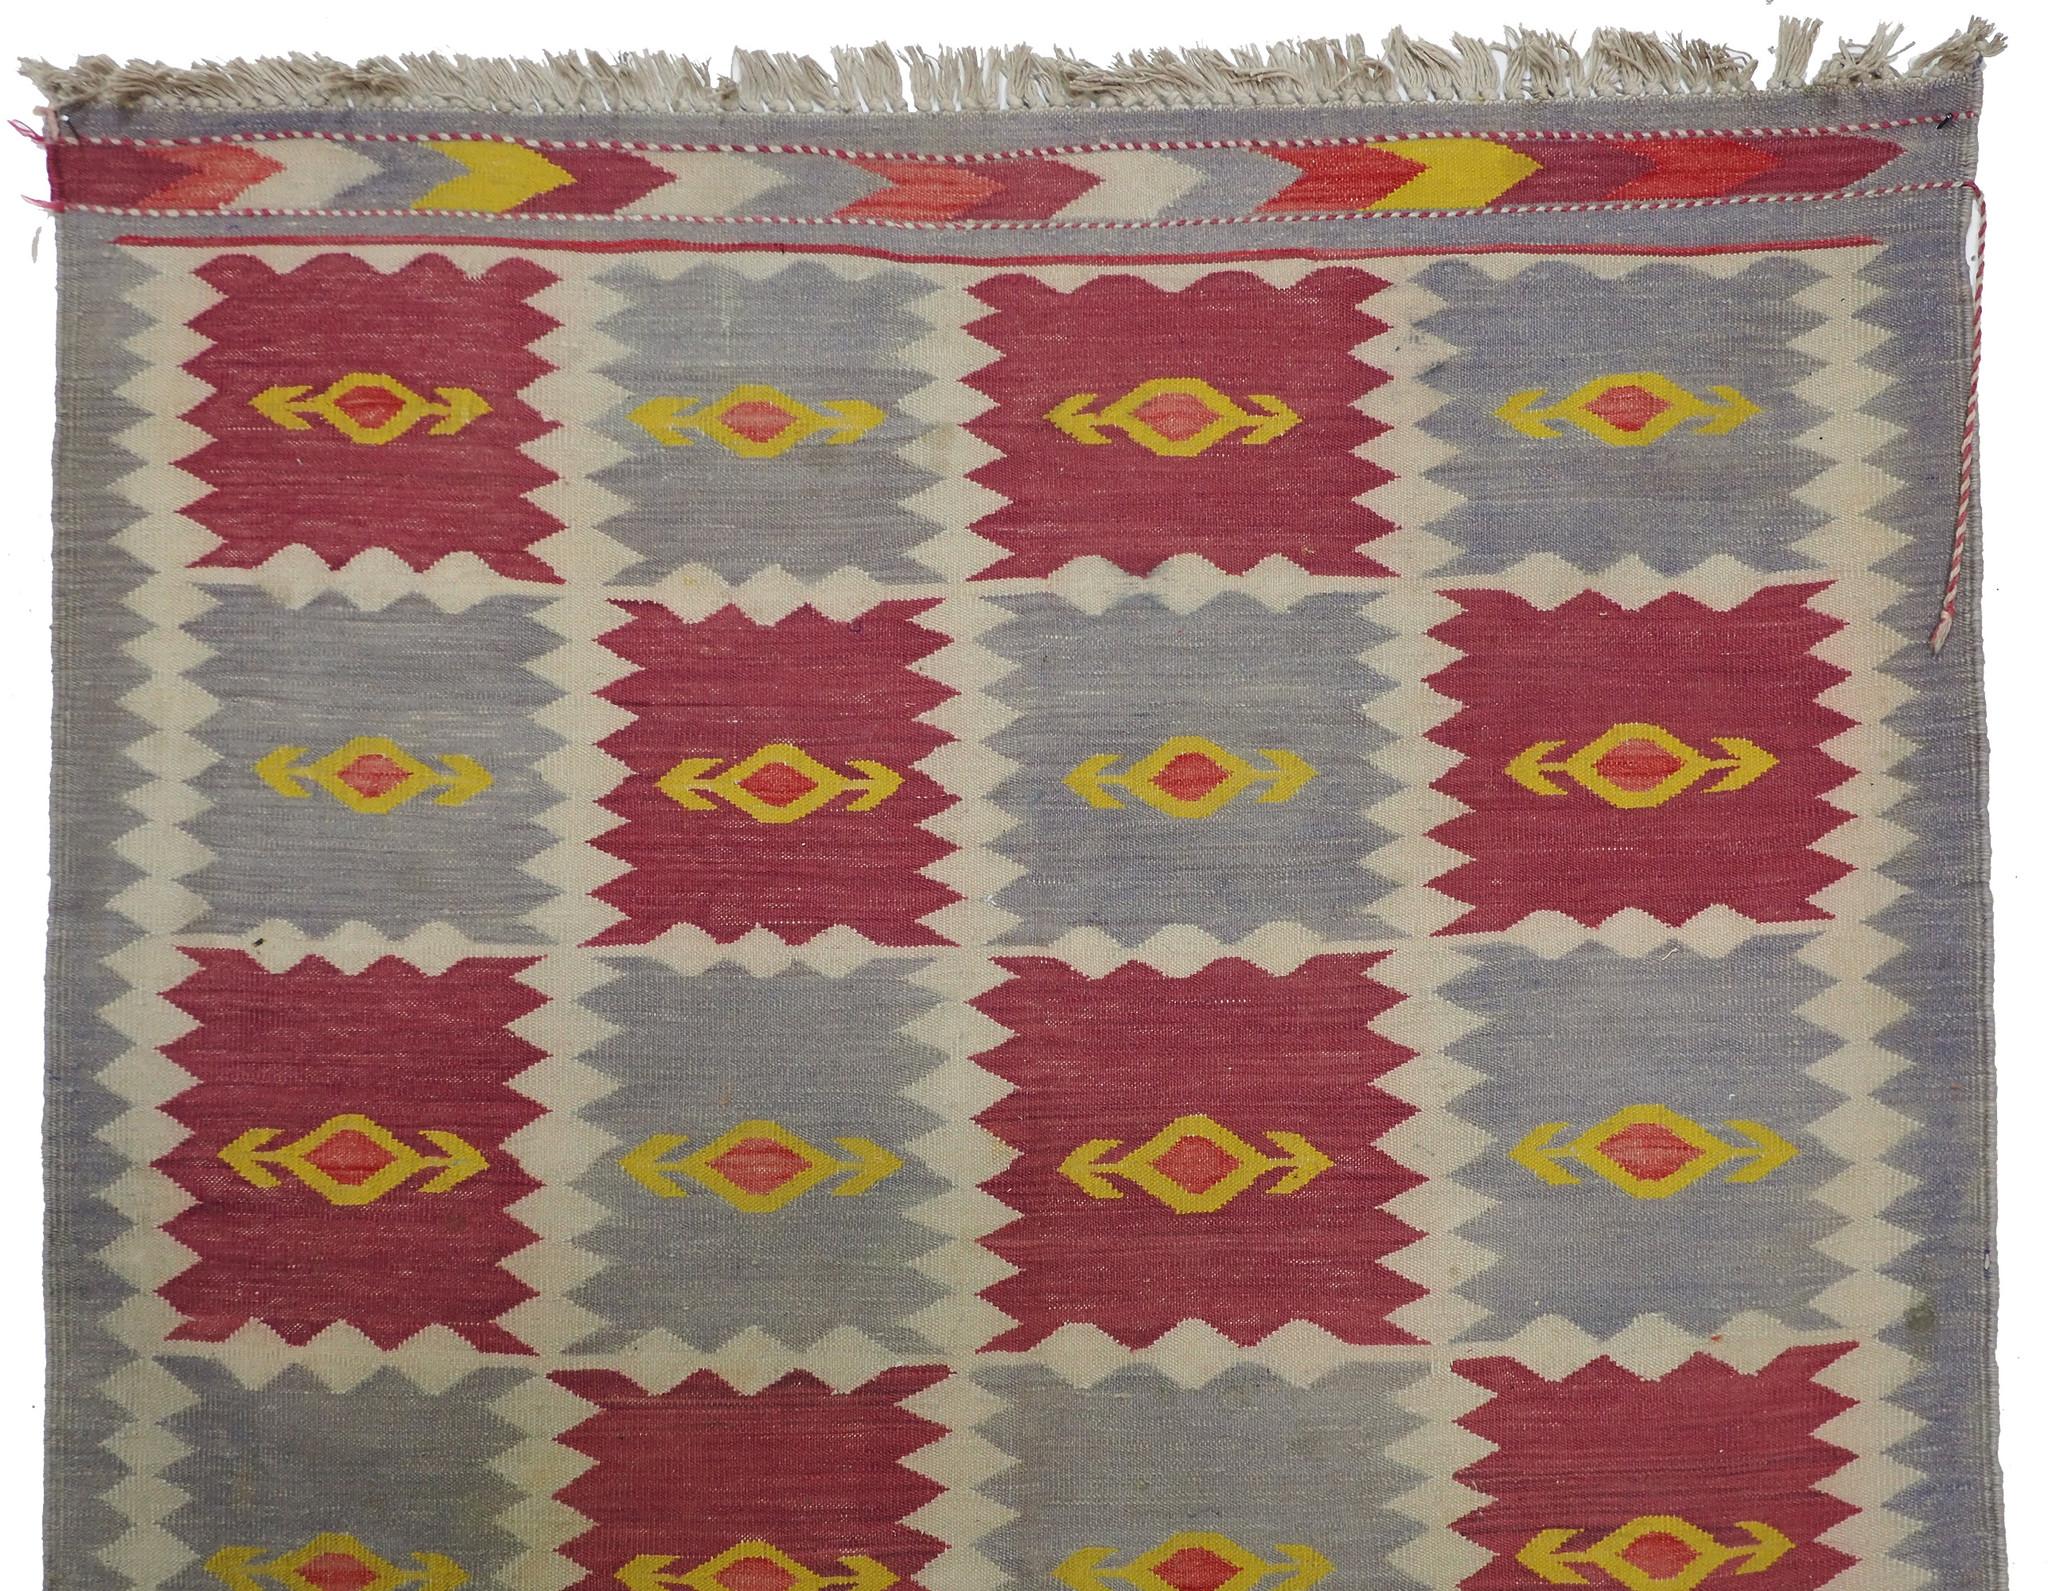 196x110 cm handgewebte orient Teppich Nomaden afghan kelim No:260